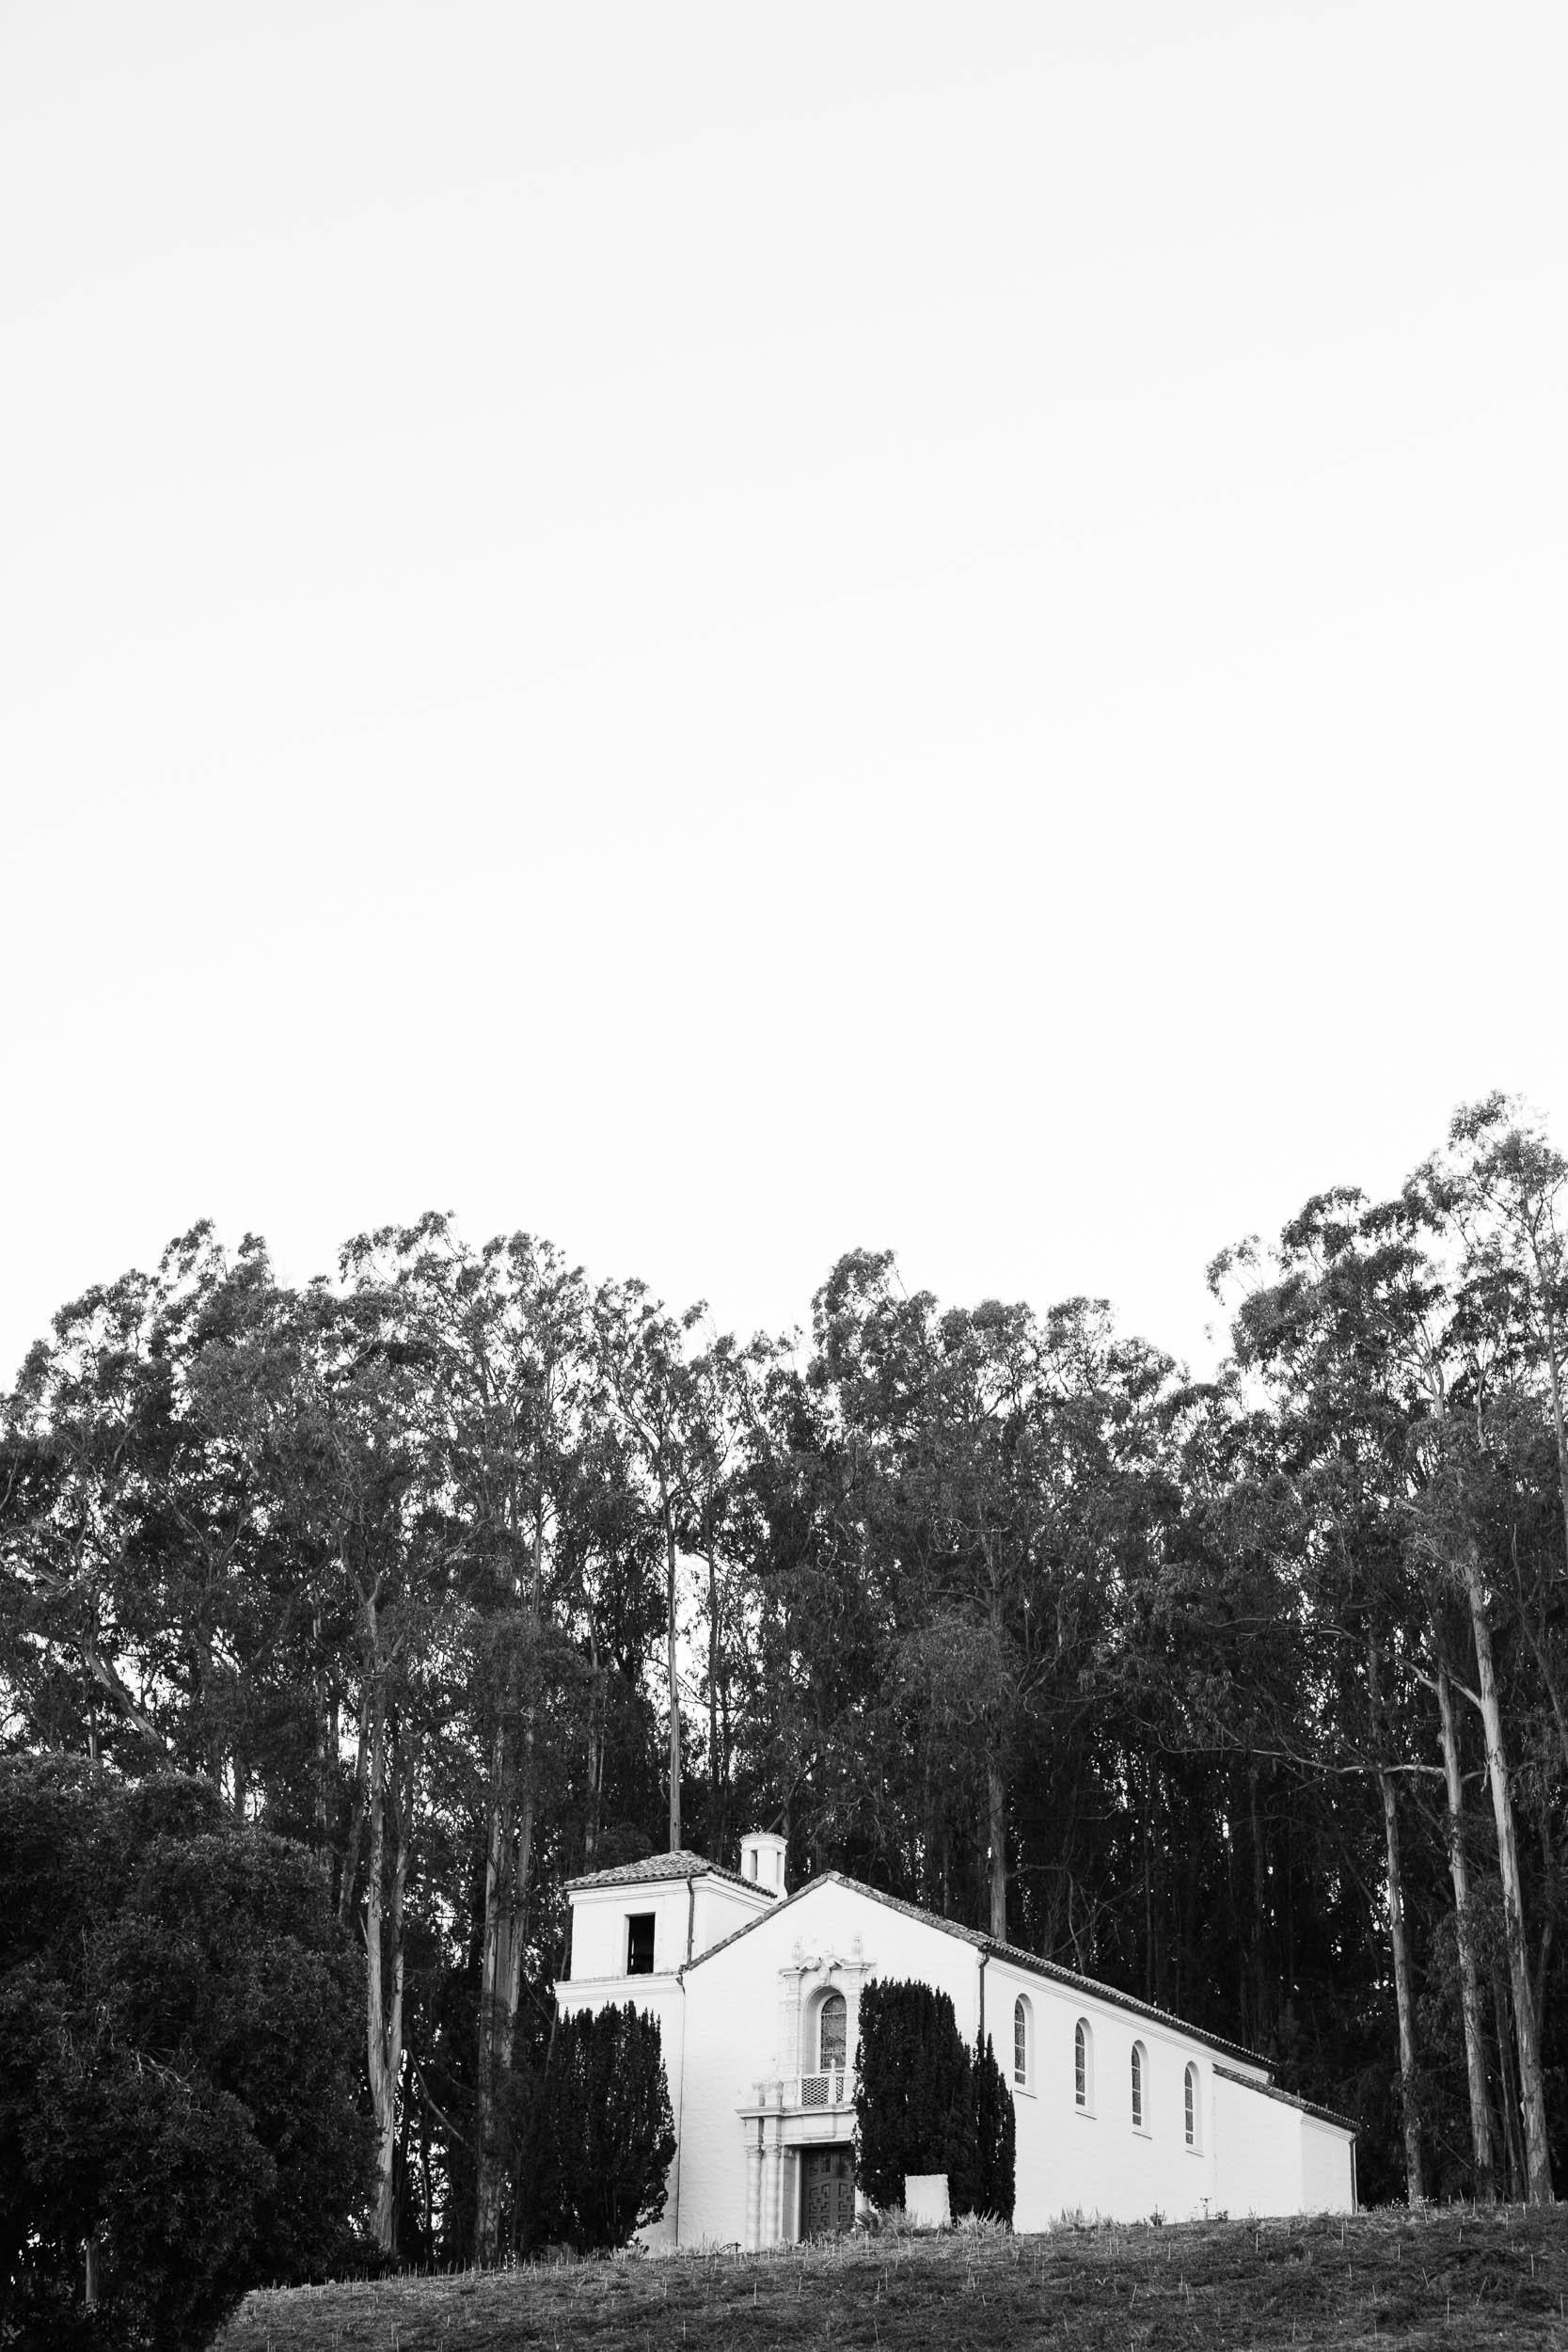 102117_C+D_Golden Gate Club Wedding_Buena Lane Photography_1202ER-3.jpg